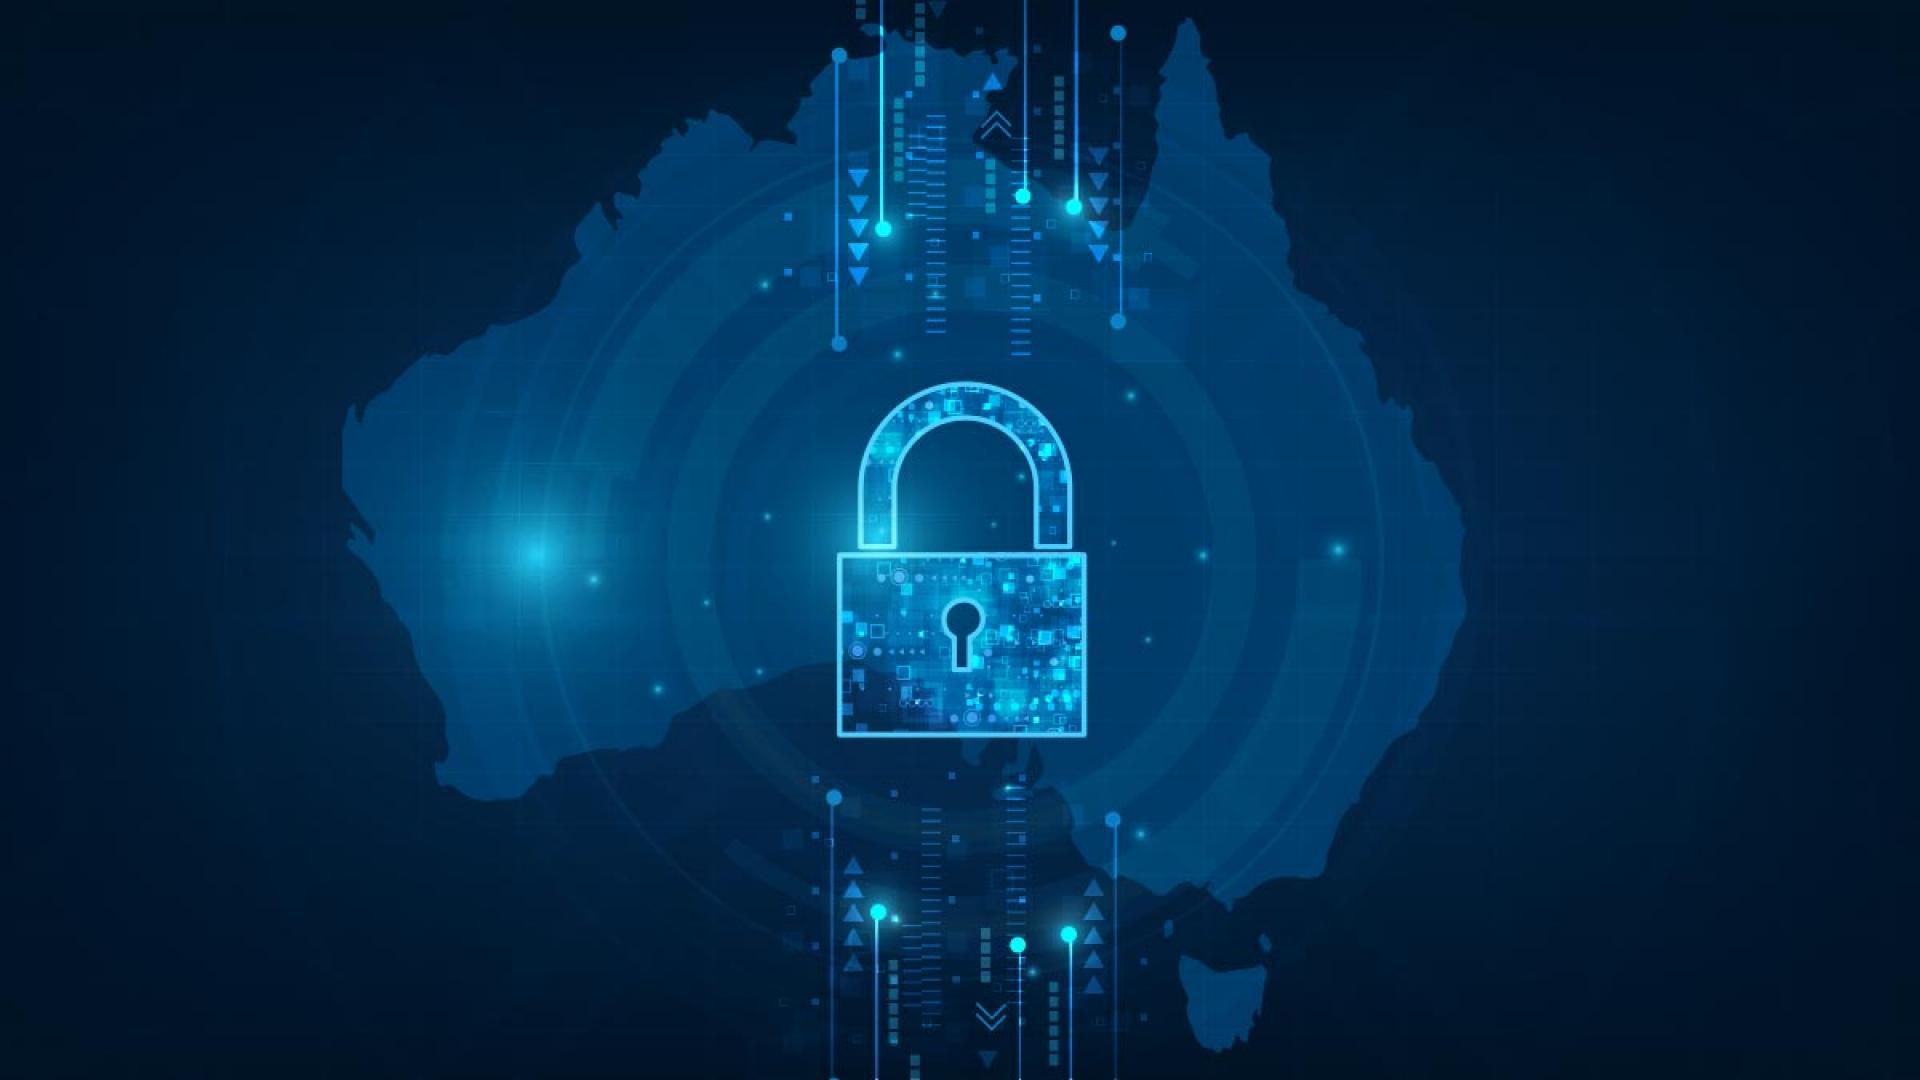 Australia under cyber attack